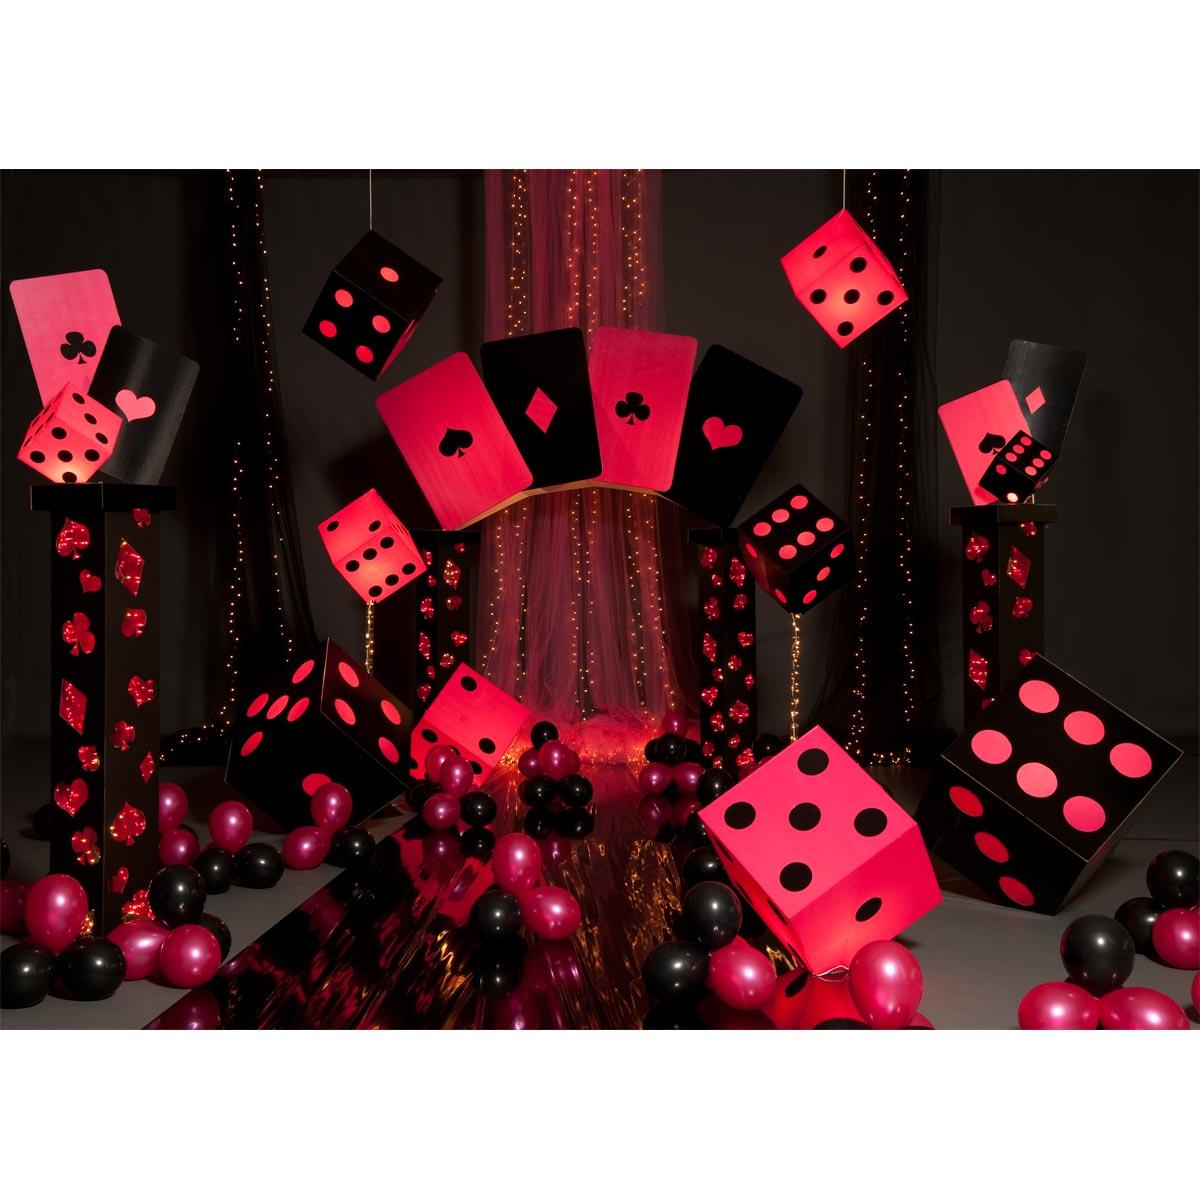 Theme casino braxton casino rama toni